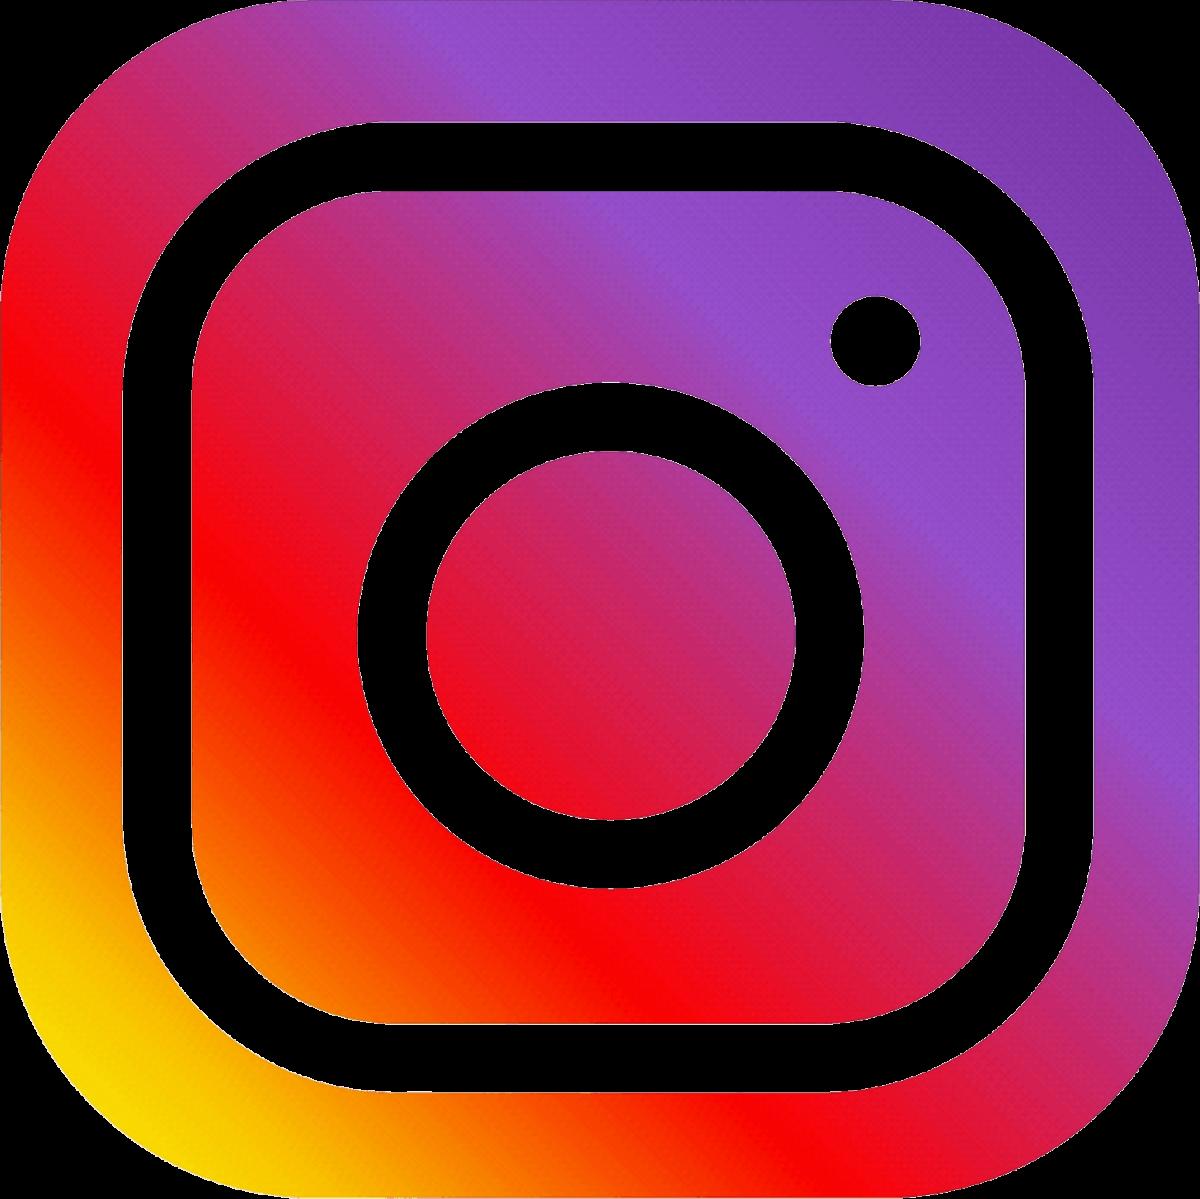 THE NEW INSTAGRAM LOGO 2020 PNG Instagram logo, New